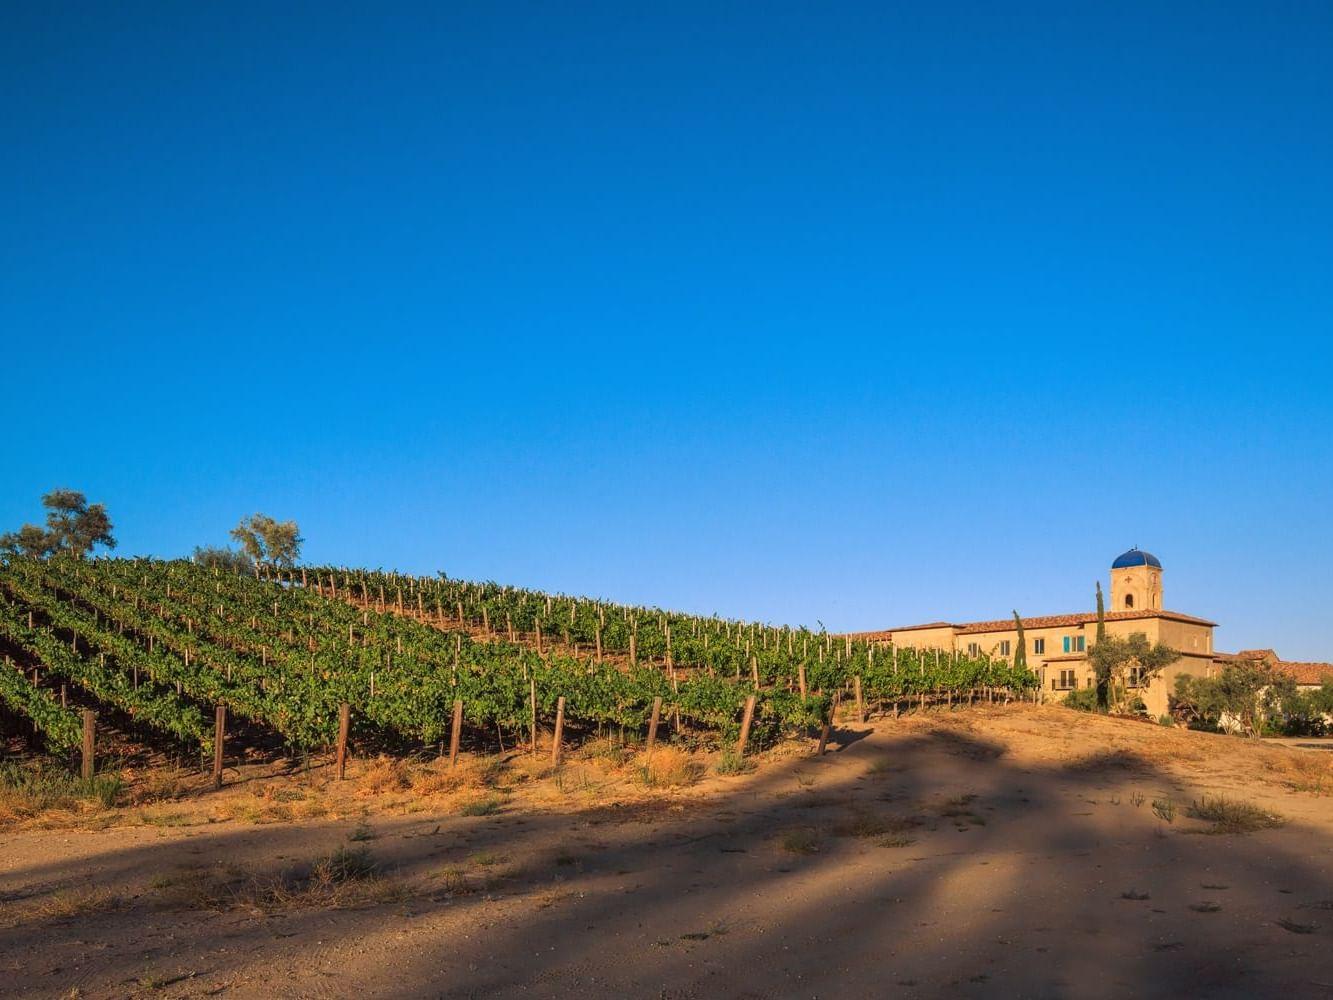 Dirt path alongside vineyard